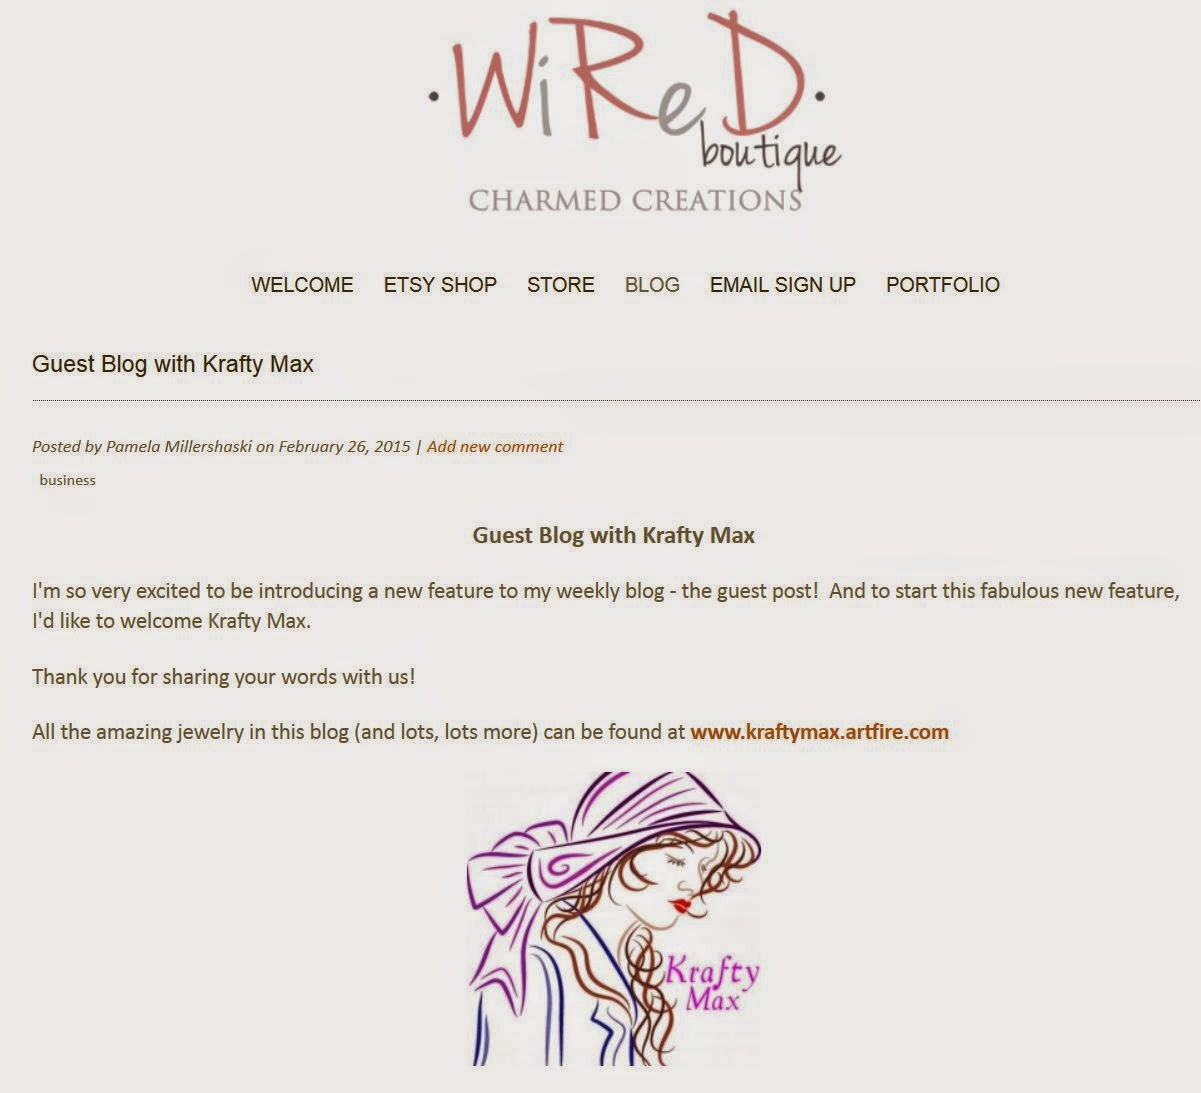 http://www.wiredboutique.com/blog/guest-blog-krafty-max